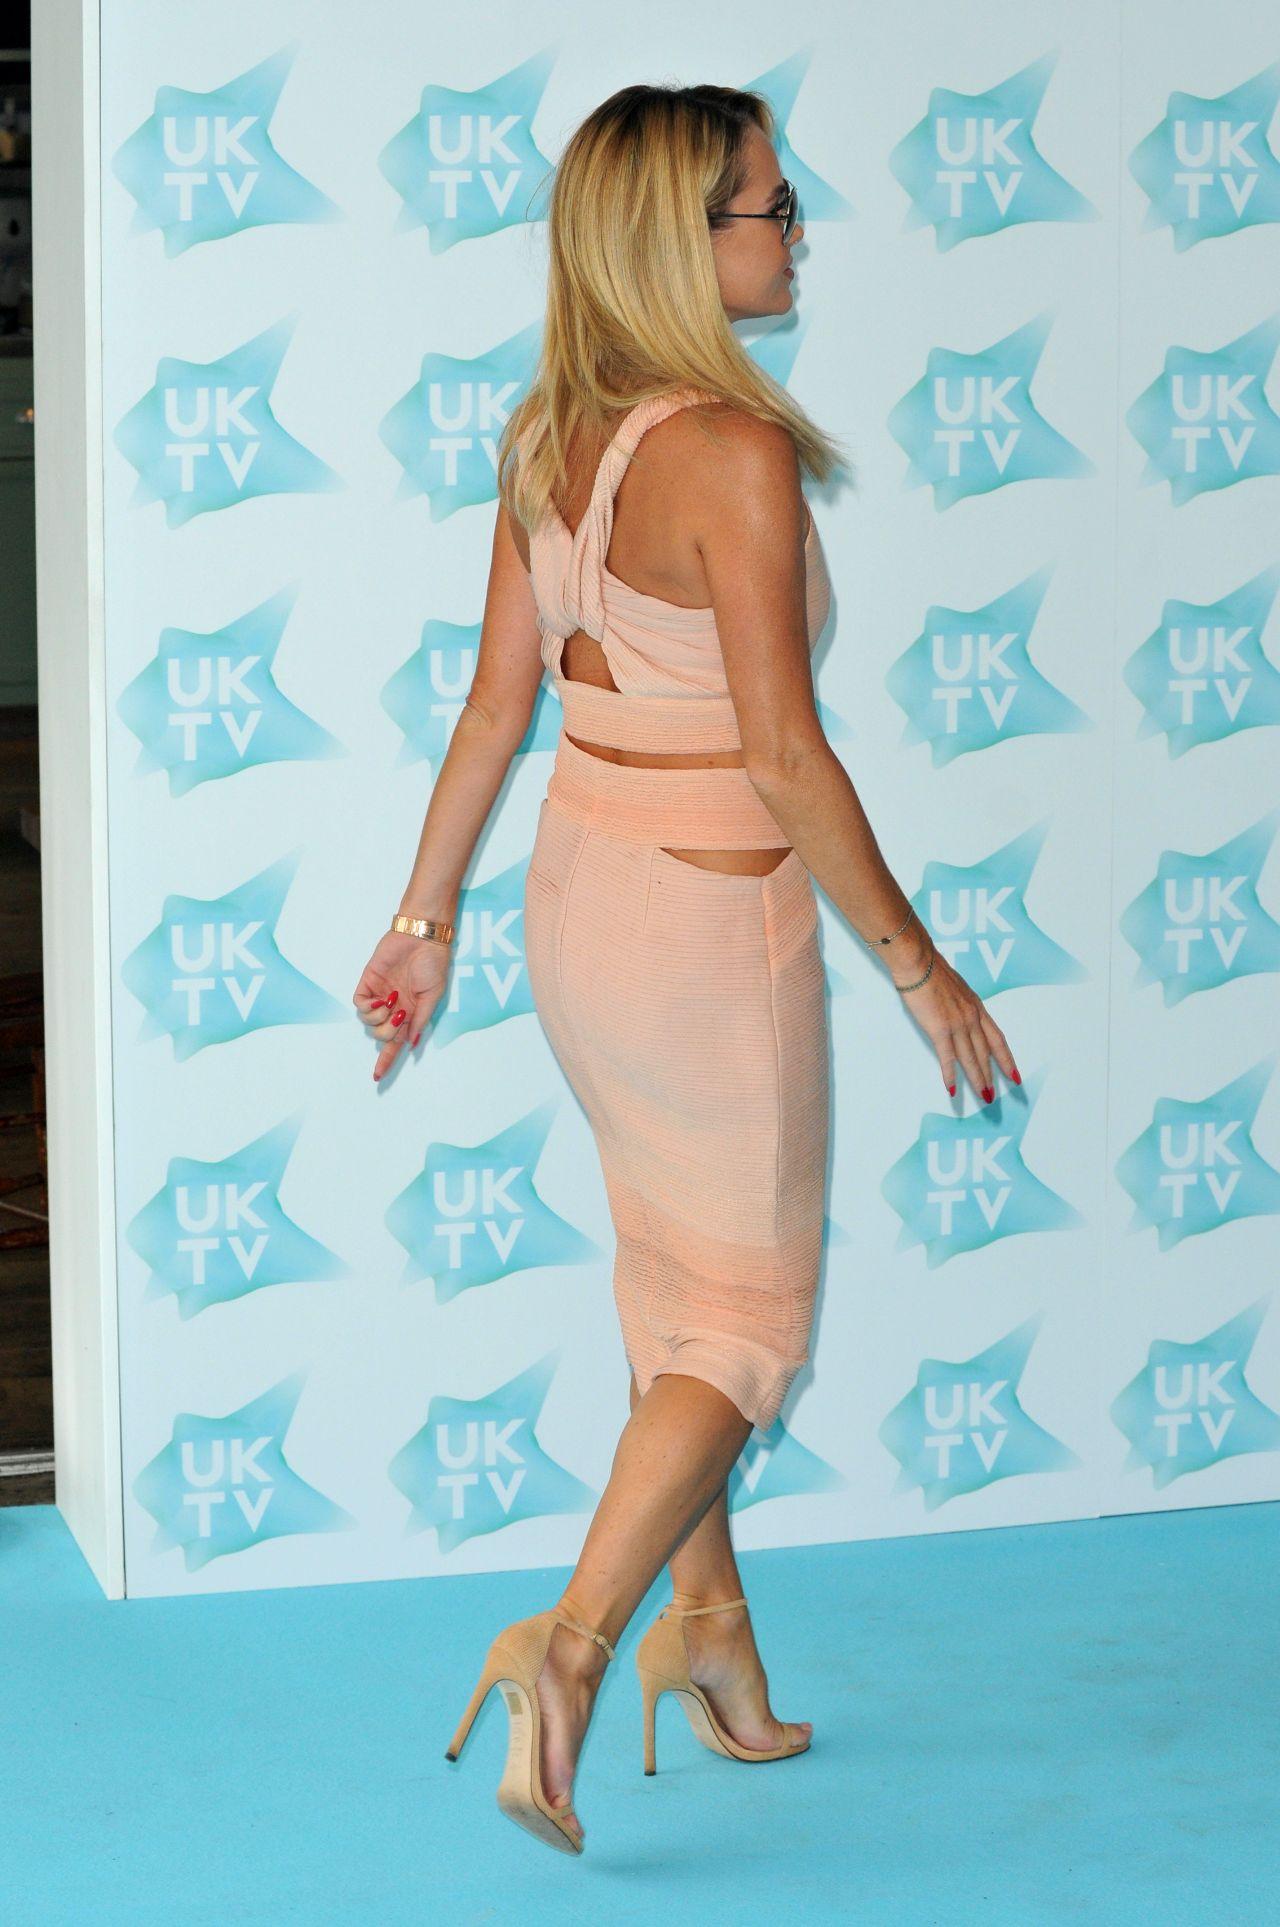 Amanda Holden Uktv Live New Season Launch In London 9